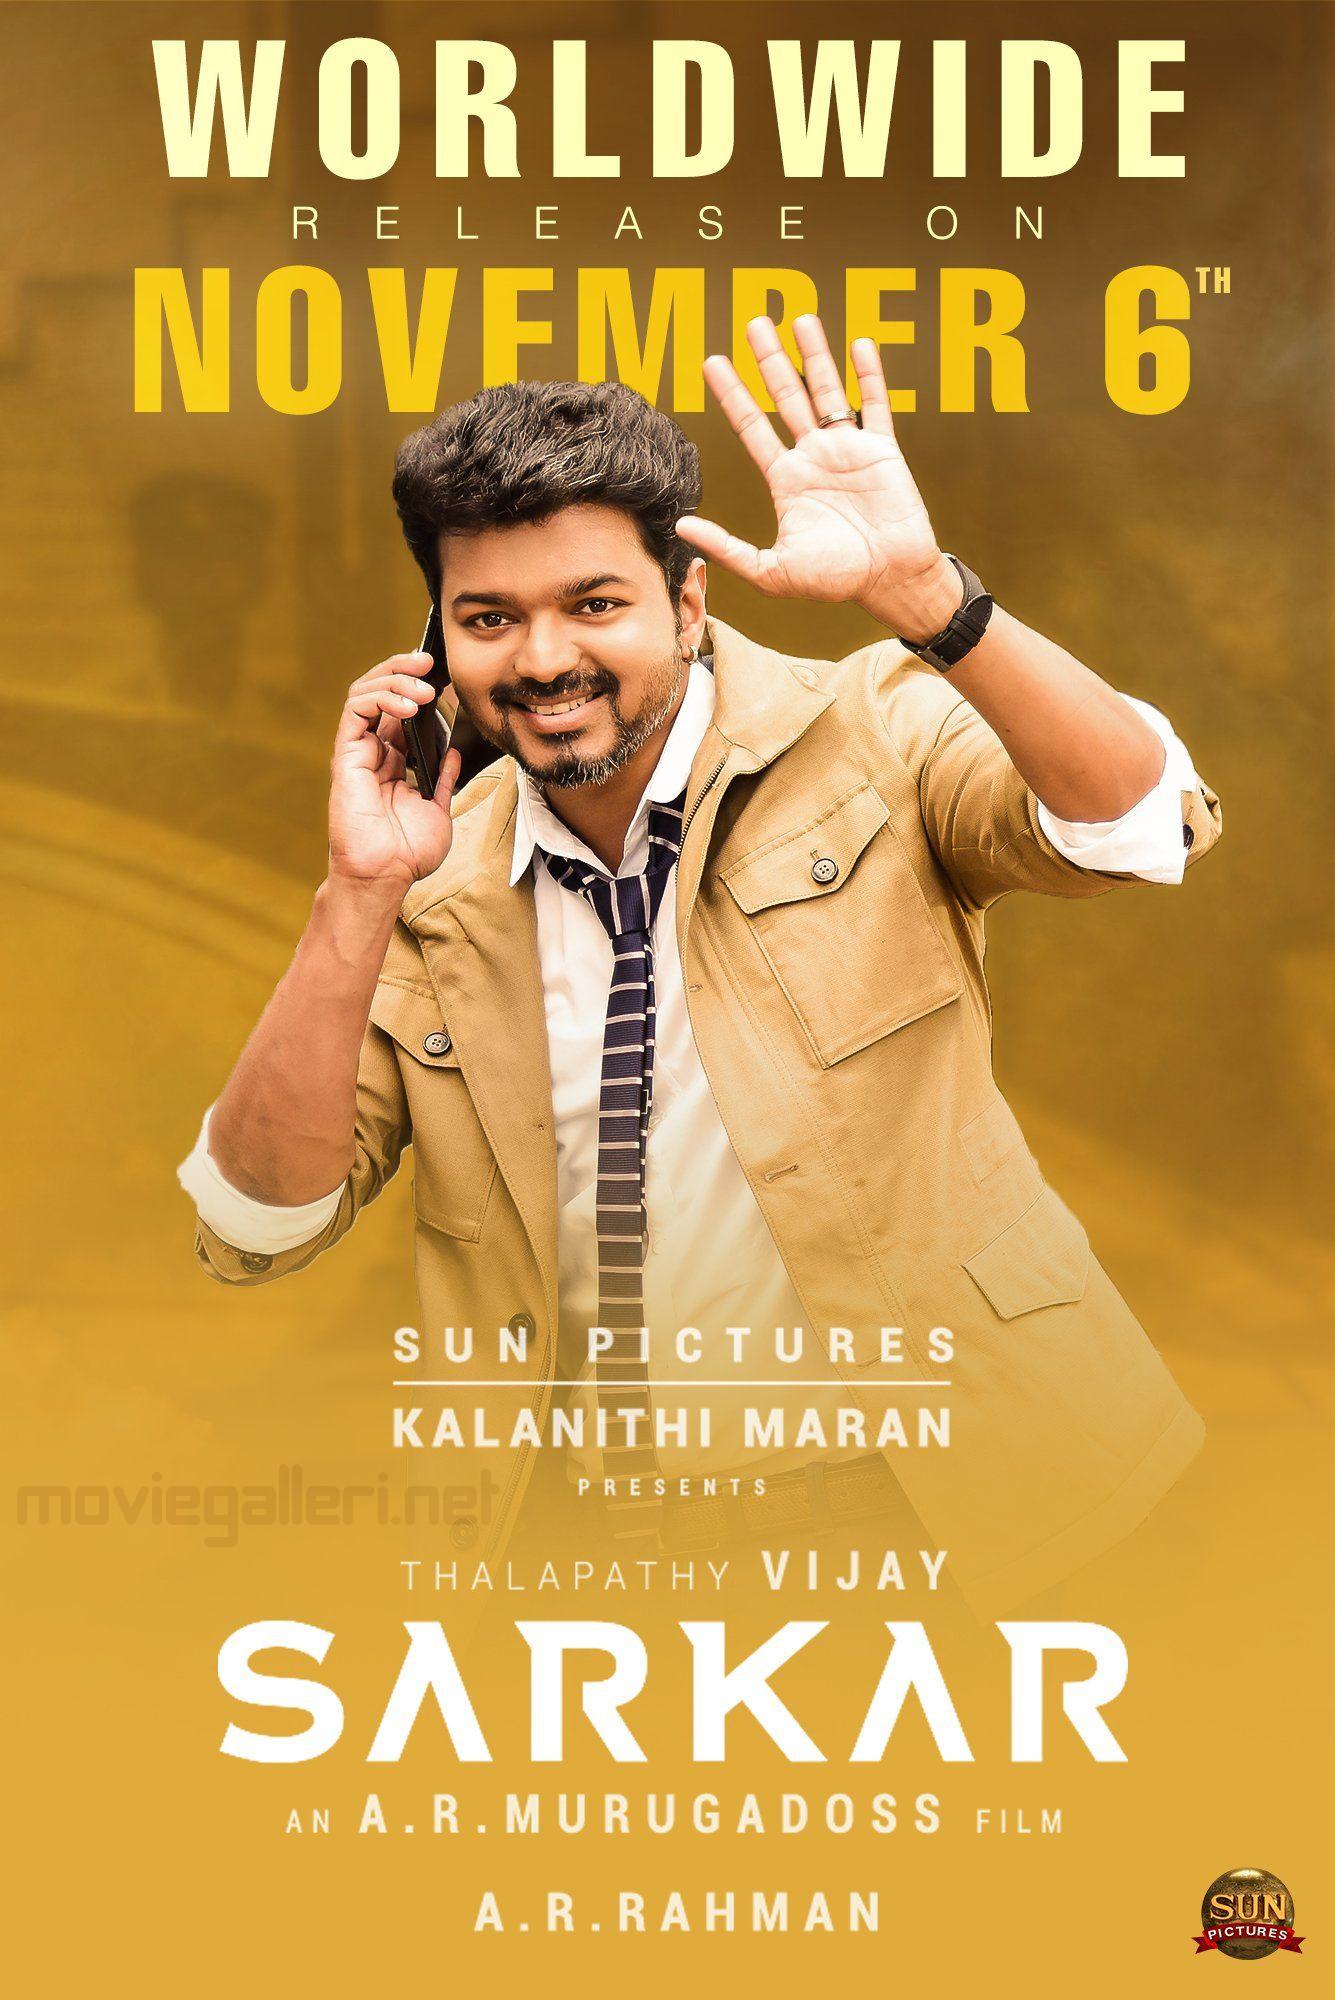 Vijay Sarkar Release on November 6th Poster HD